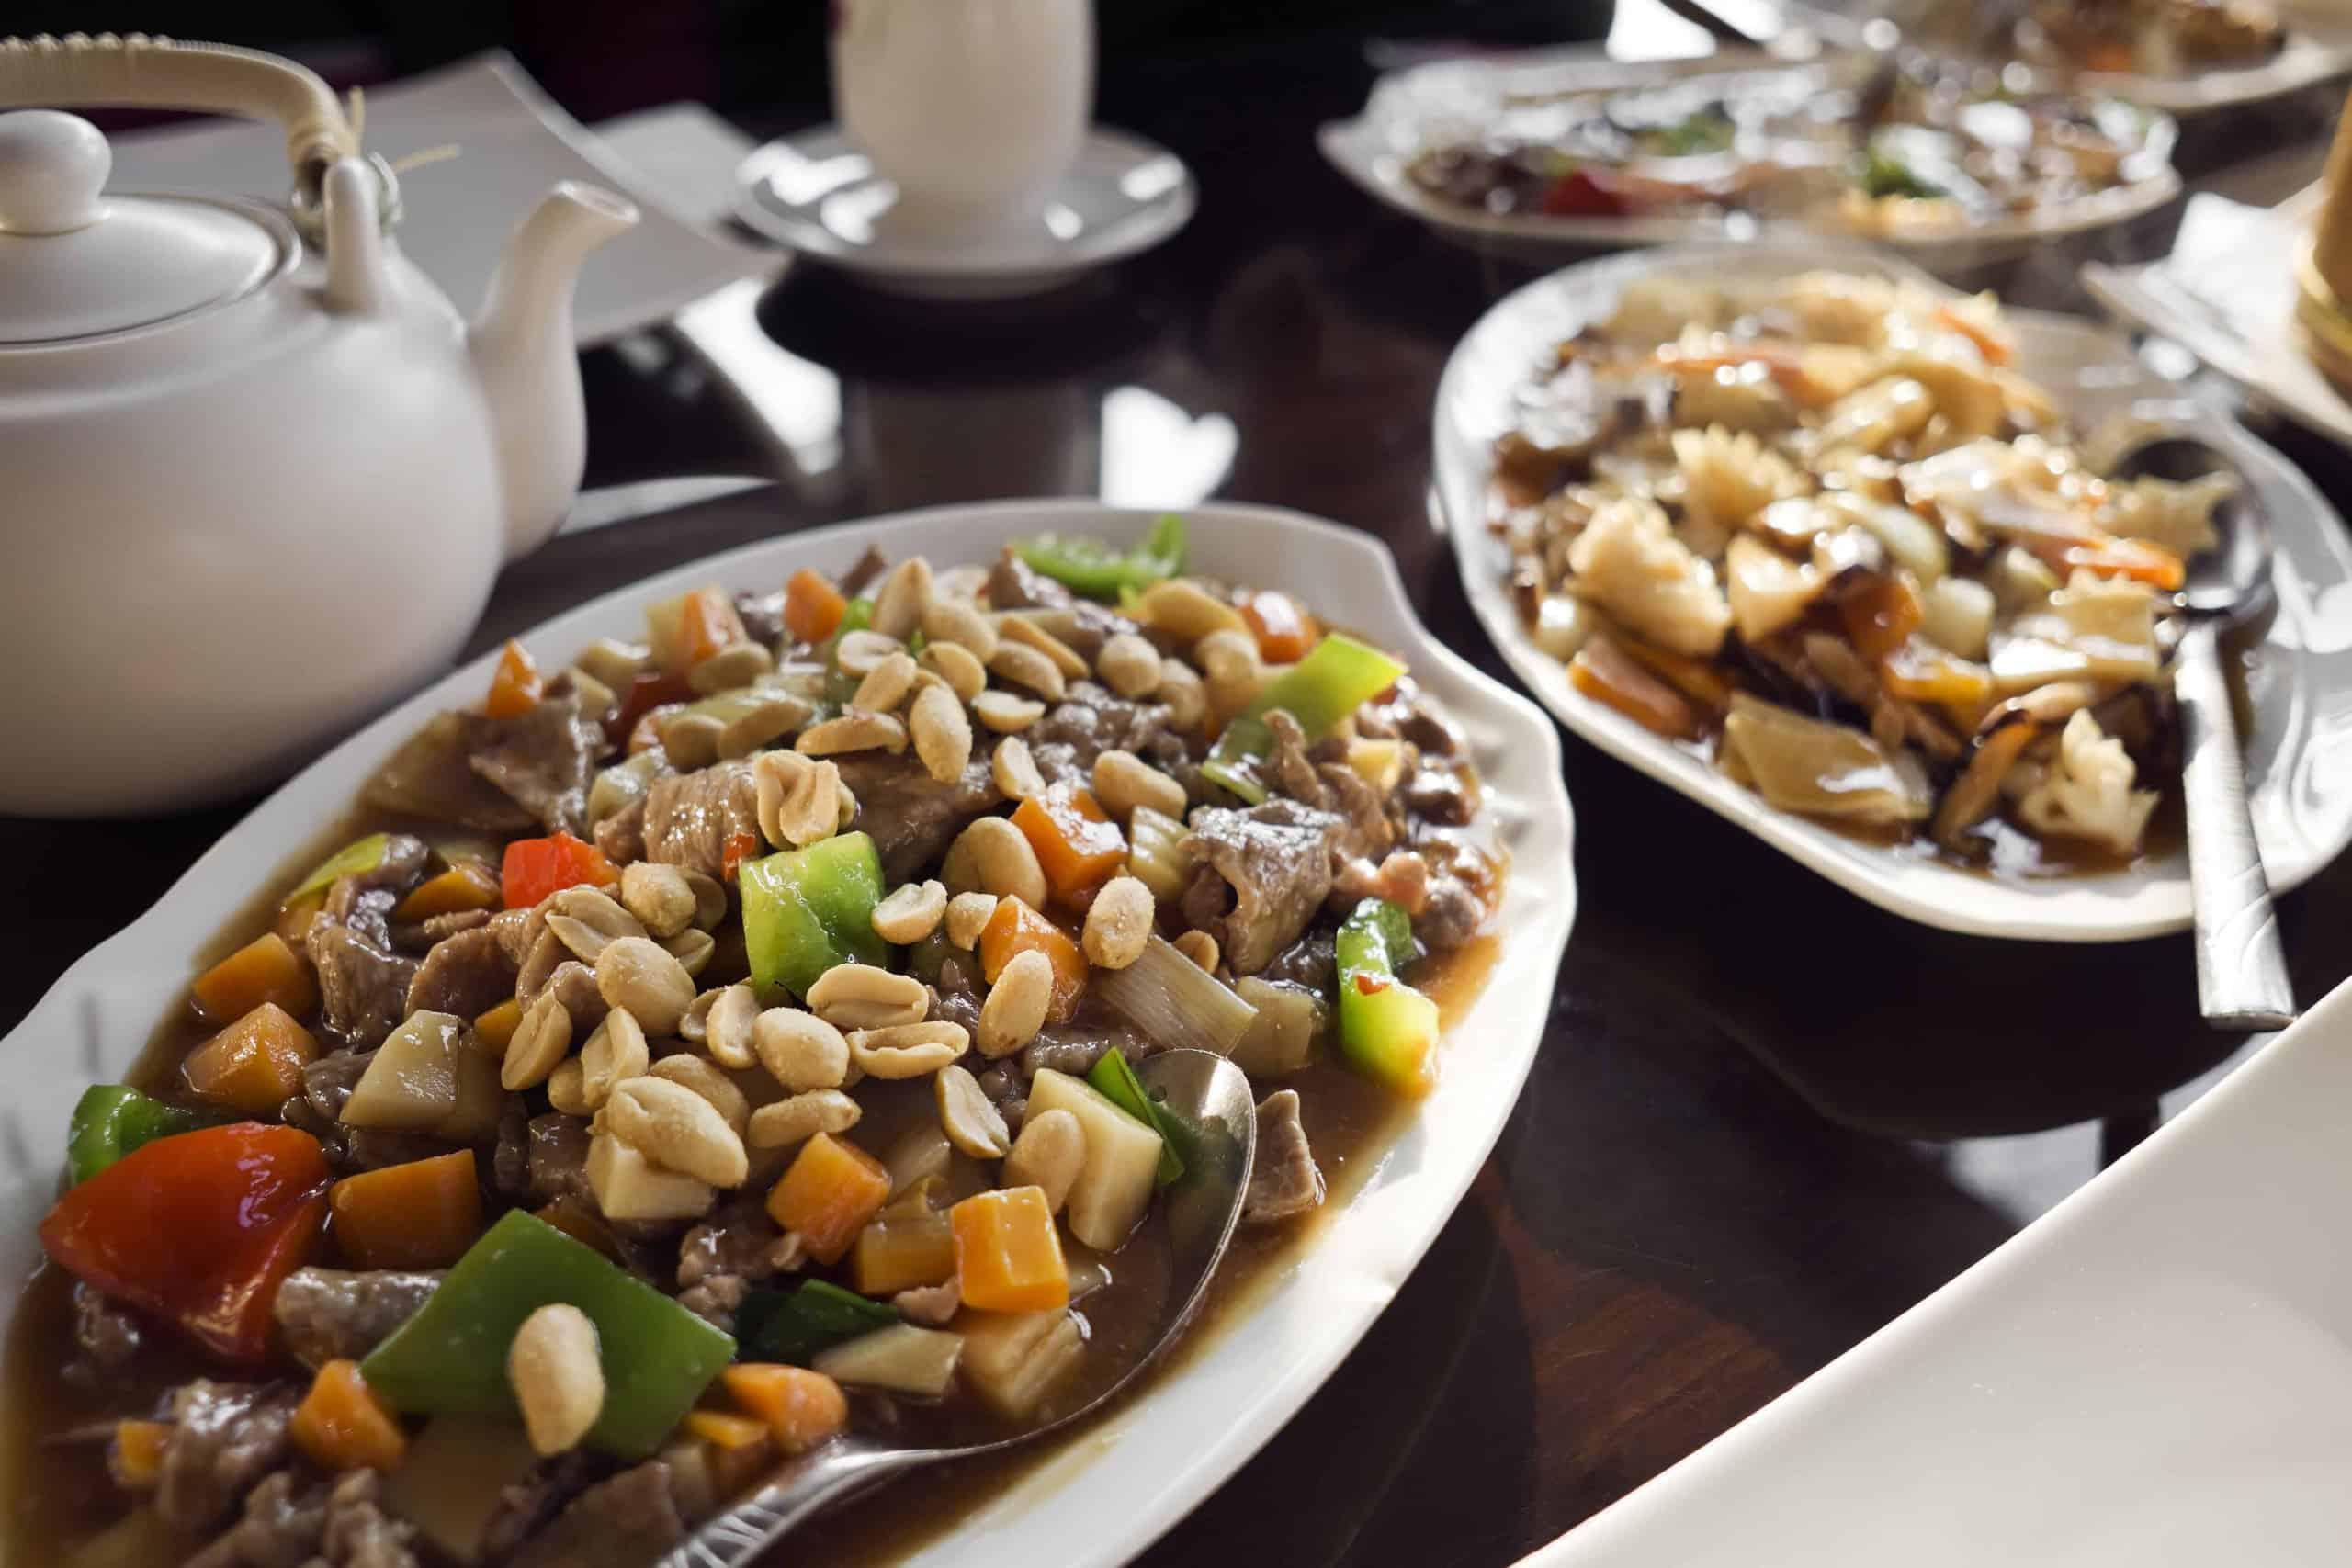 Food in Burma